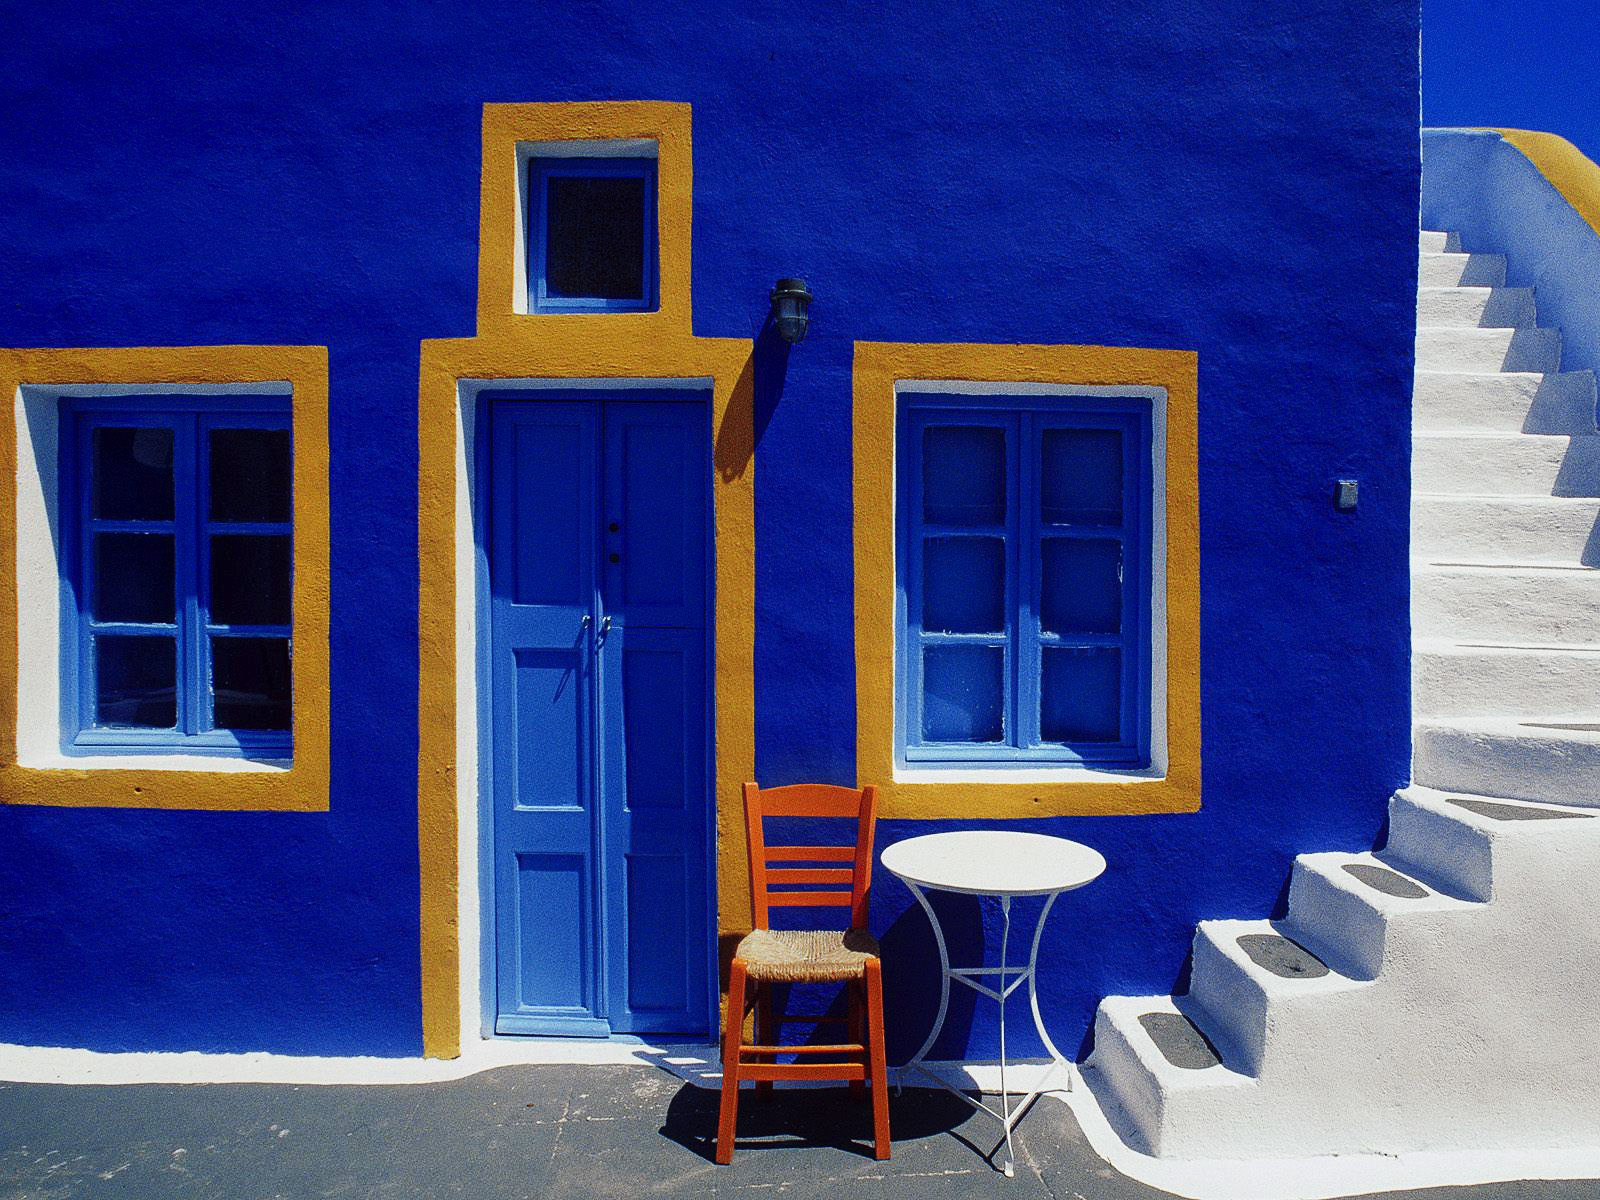 Greece. Grecian Holiday Travel Inspiration (6)